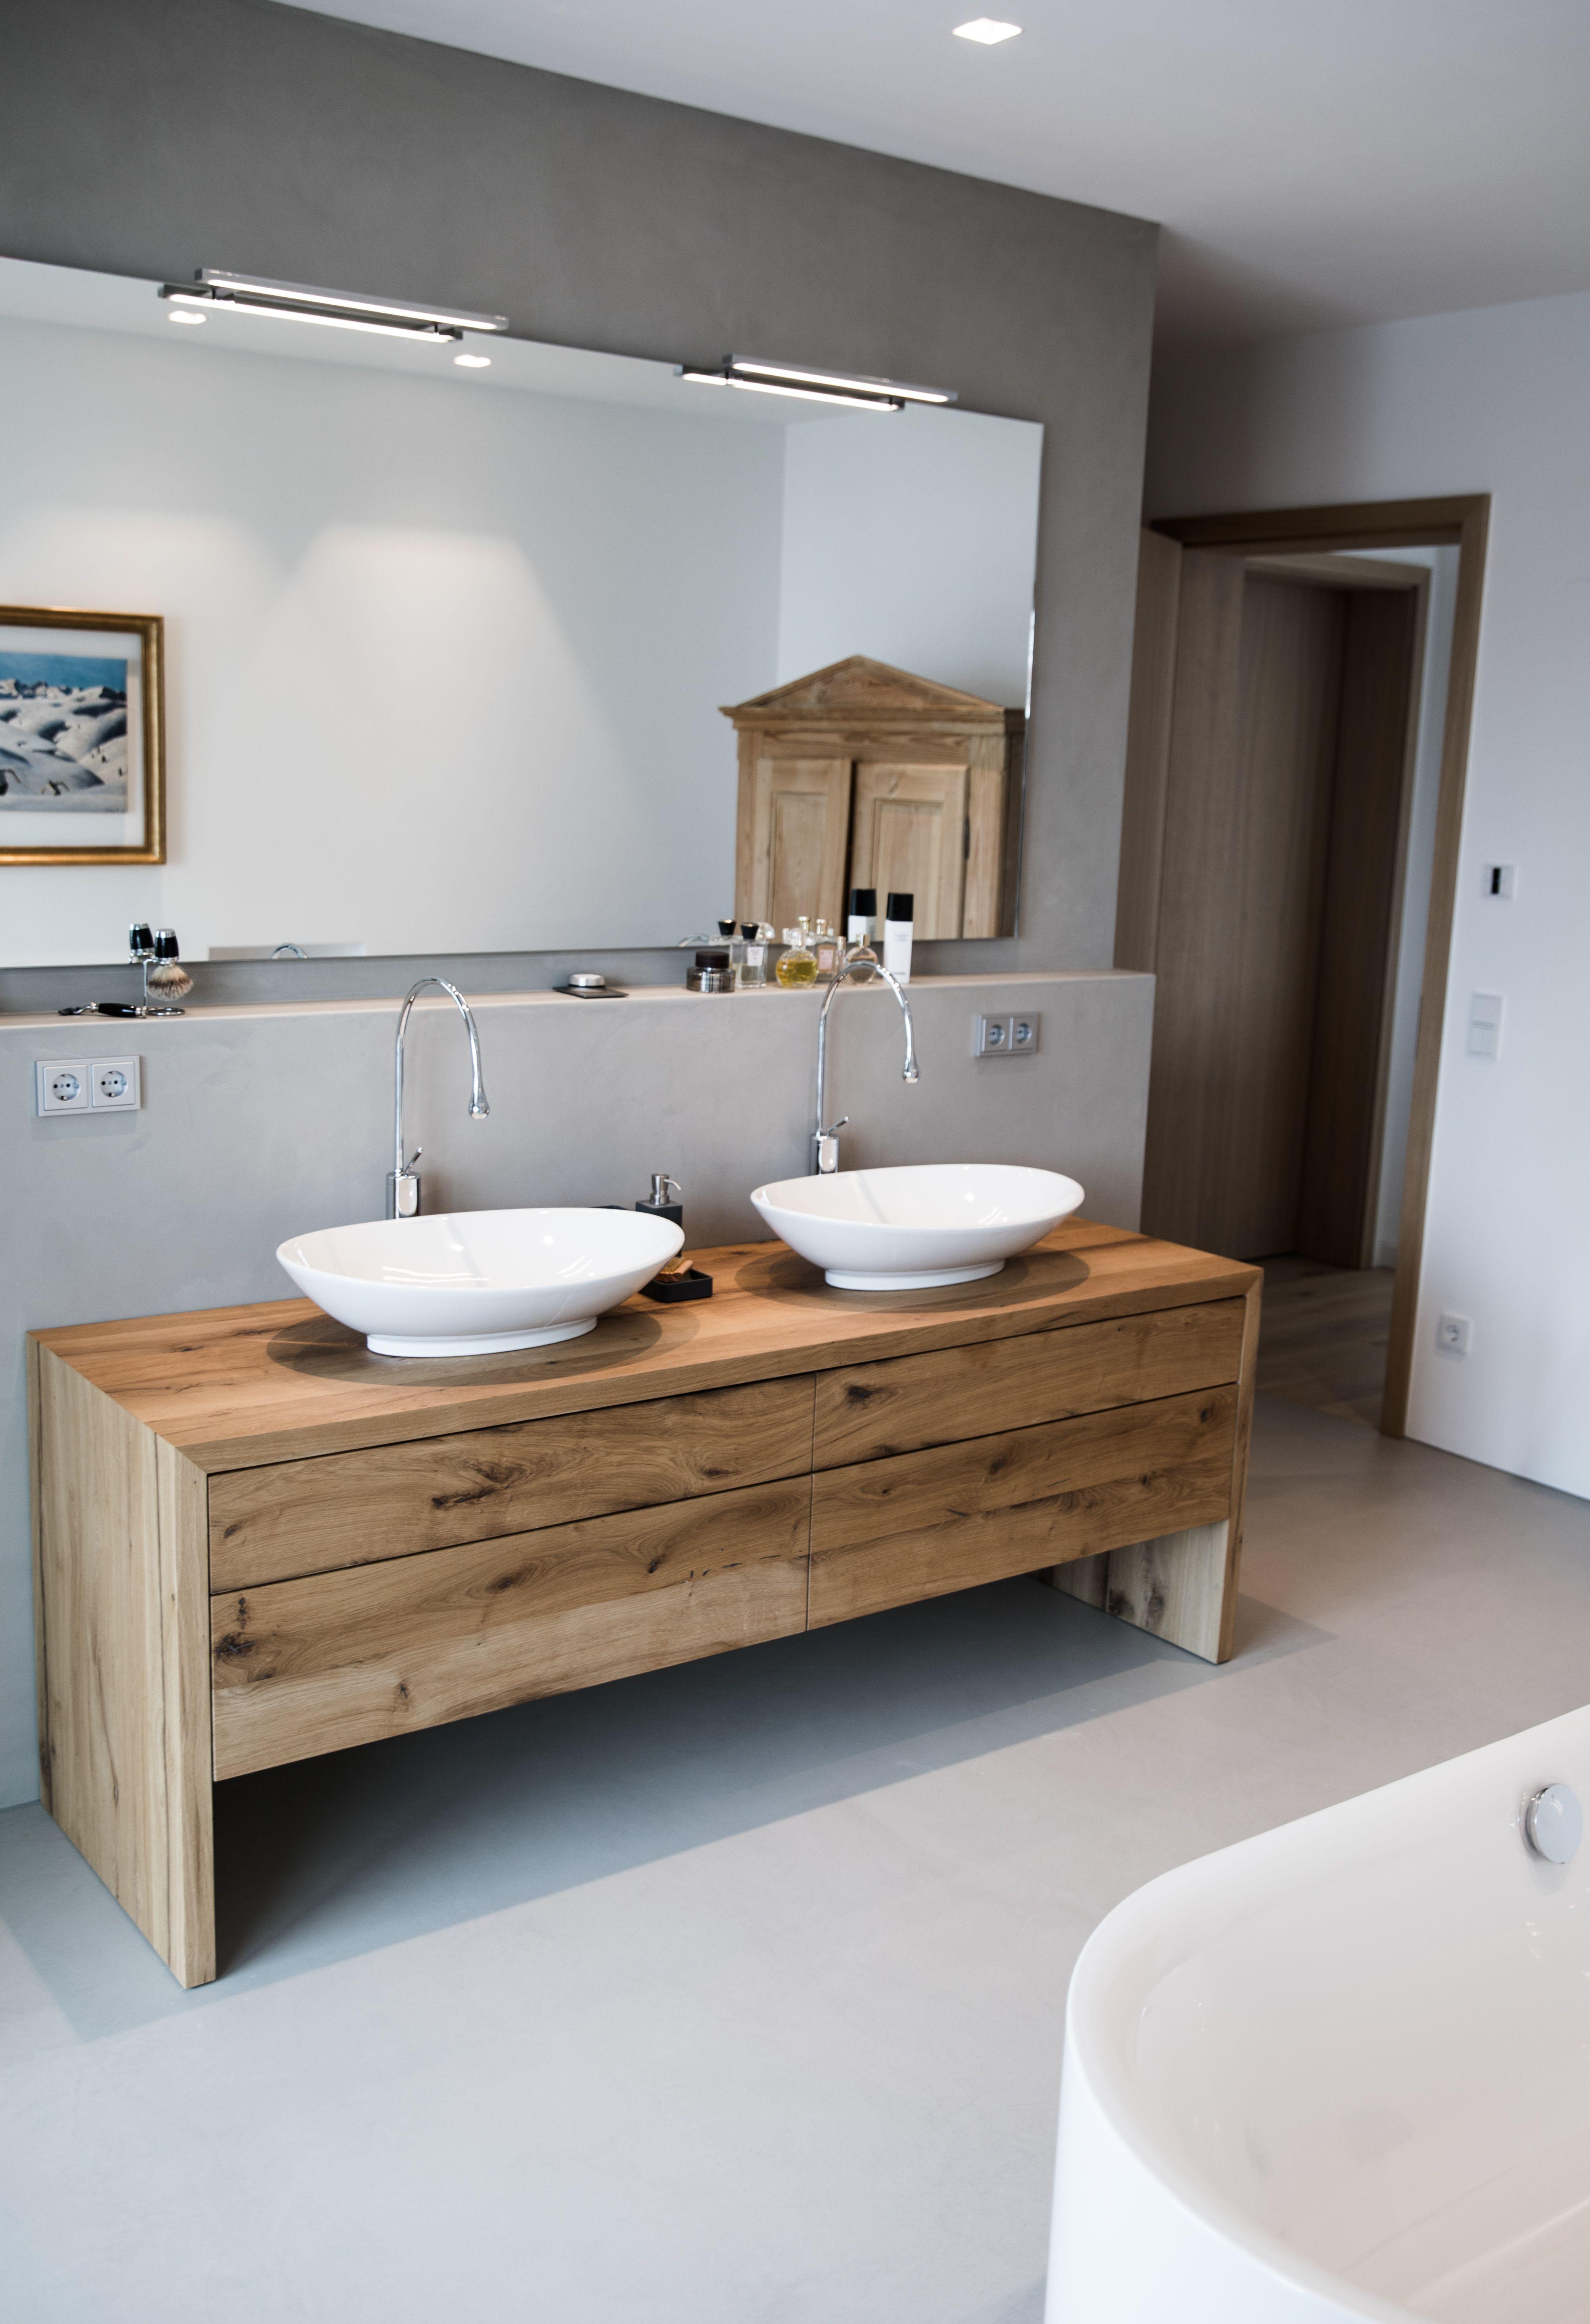 Badezimmerboden Designboden Badezimmer Badmobel Badezimmermobel Badmobel Set Spiegelschrank Bad Badezi In 2020 Bathroom Flooring Bathroom Interior Bathroom Design